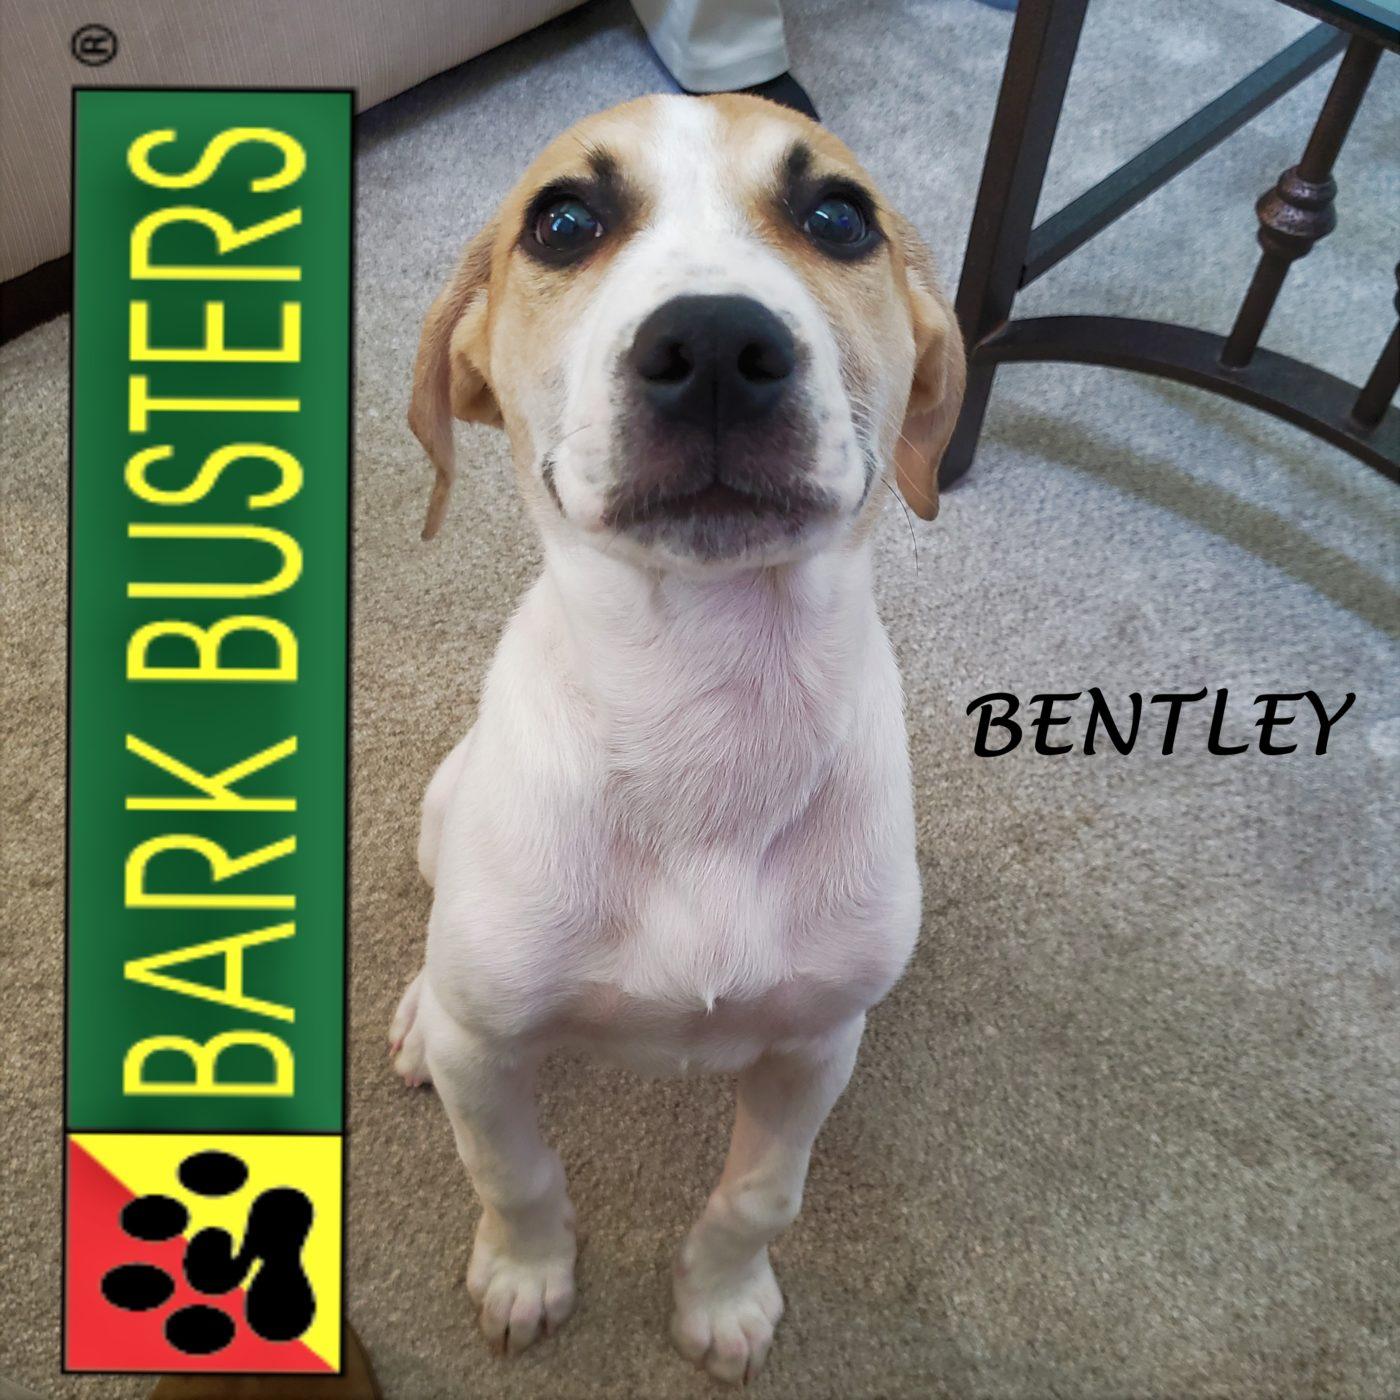 #beaglemix #puppytraining #boopmynose #dogtraininggeorgetown #dogtrainernearme #barkbusters #abetterwaytoabetterdog #inhomedogtraining